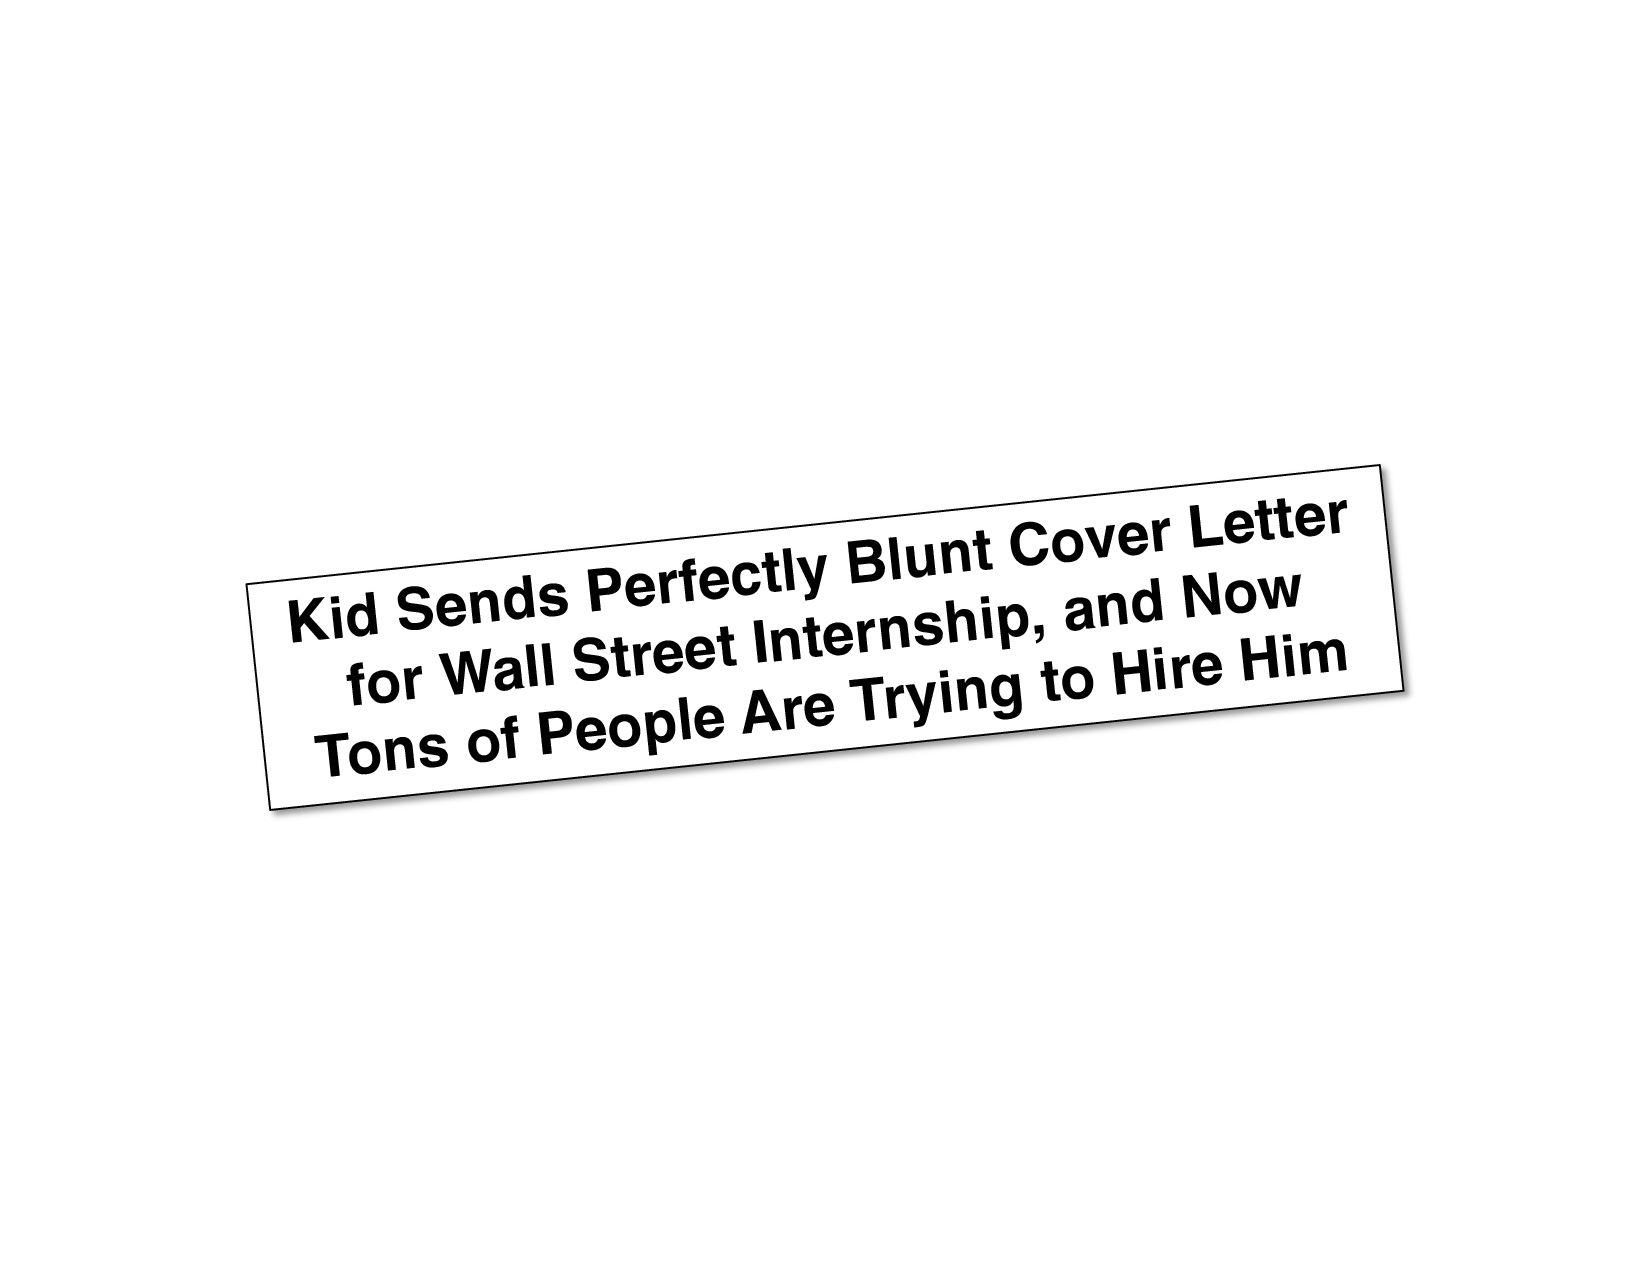 3 Reasons Why You Should Hire Me Jonathan Rick